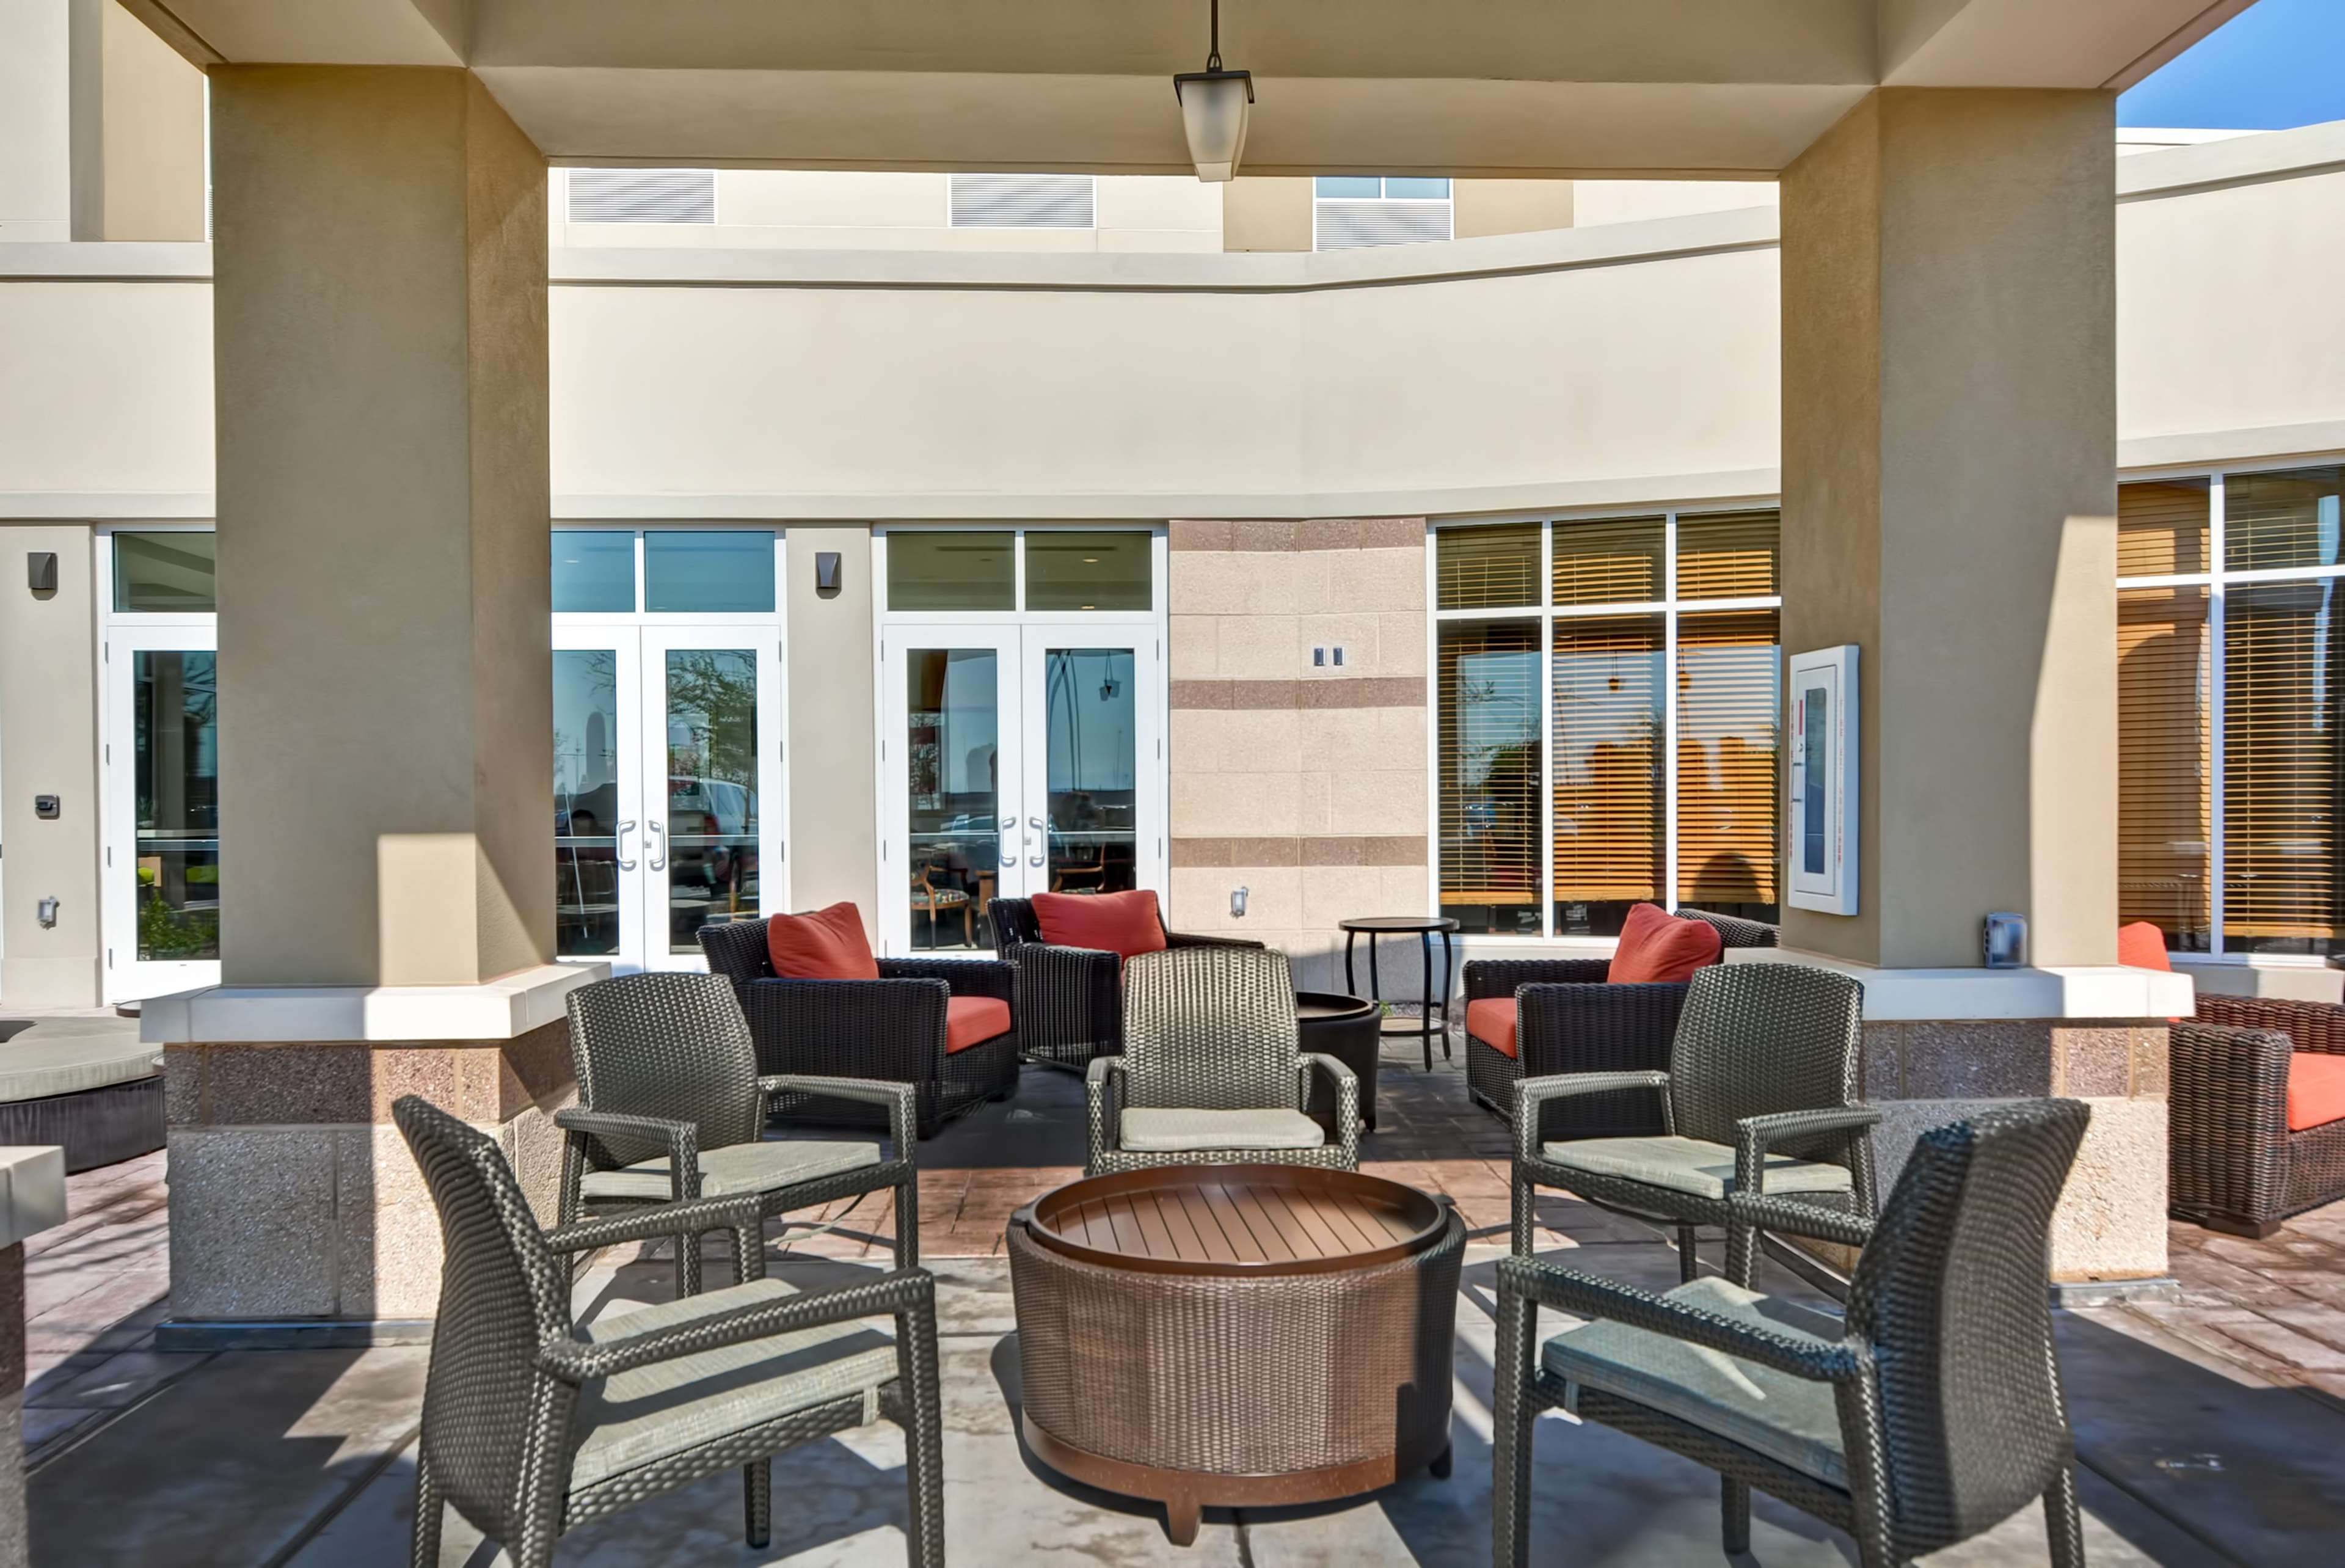 Hilton Garden Inn Phoenix/Tempe ASU Area image 1